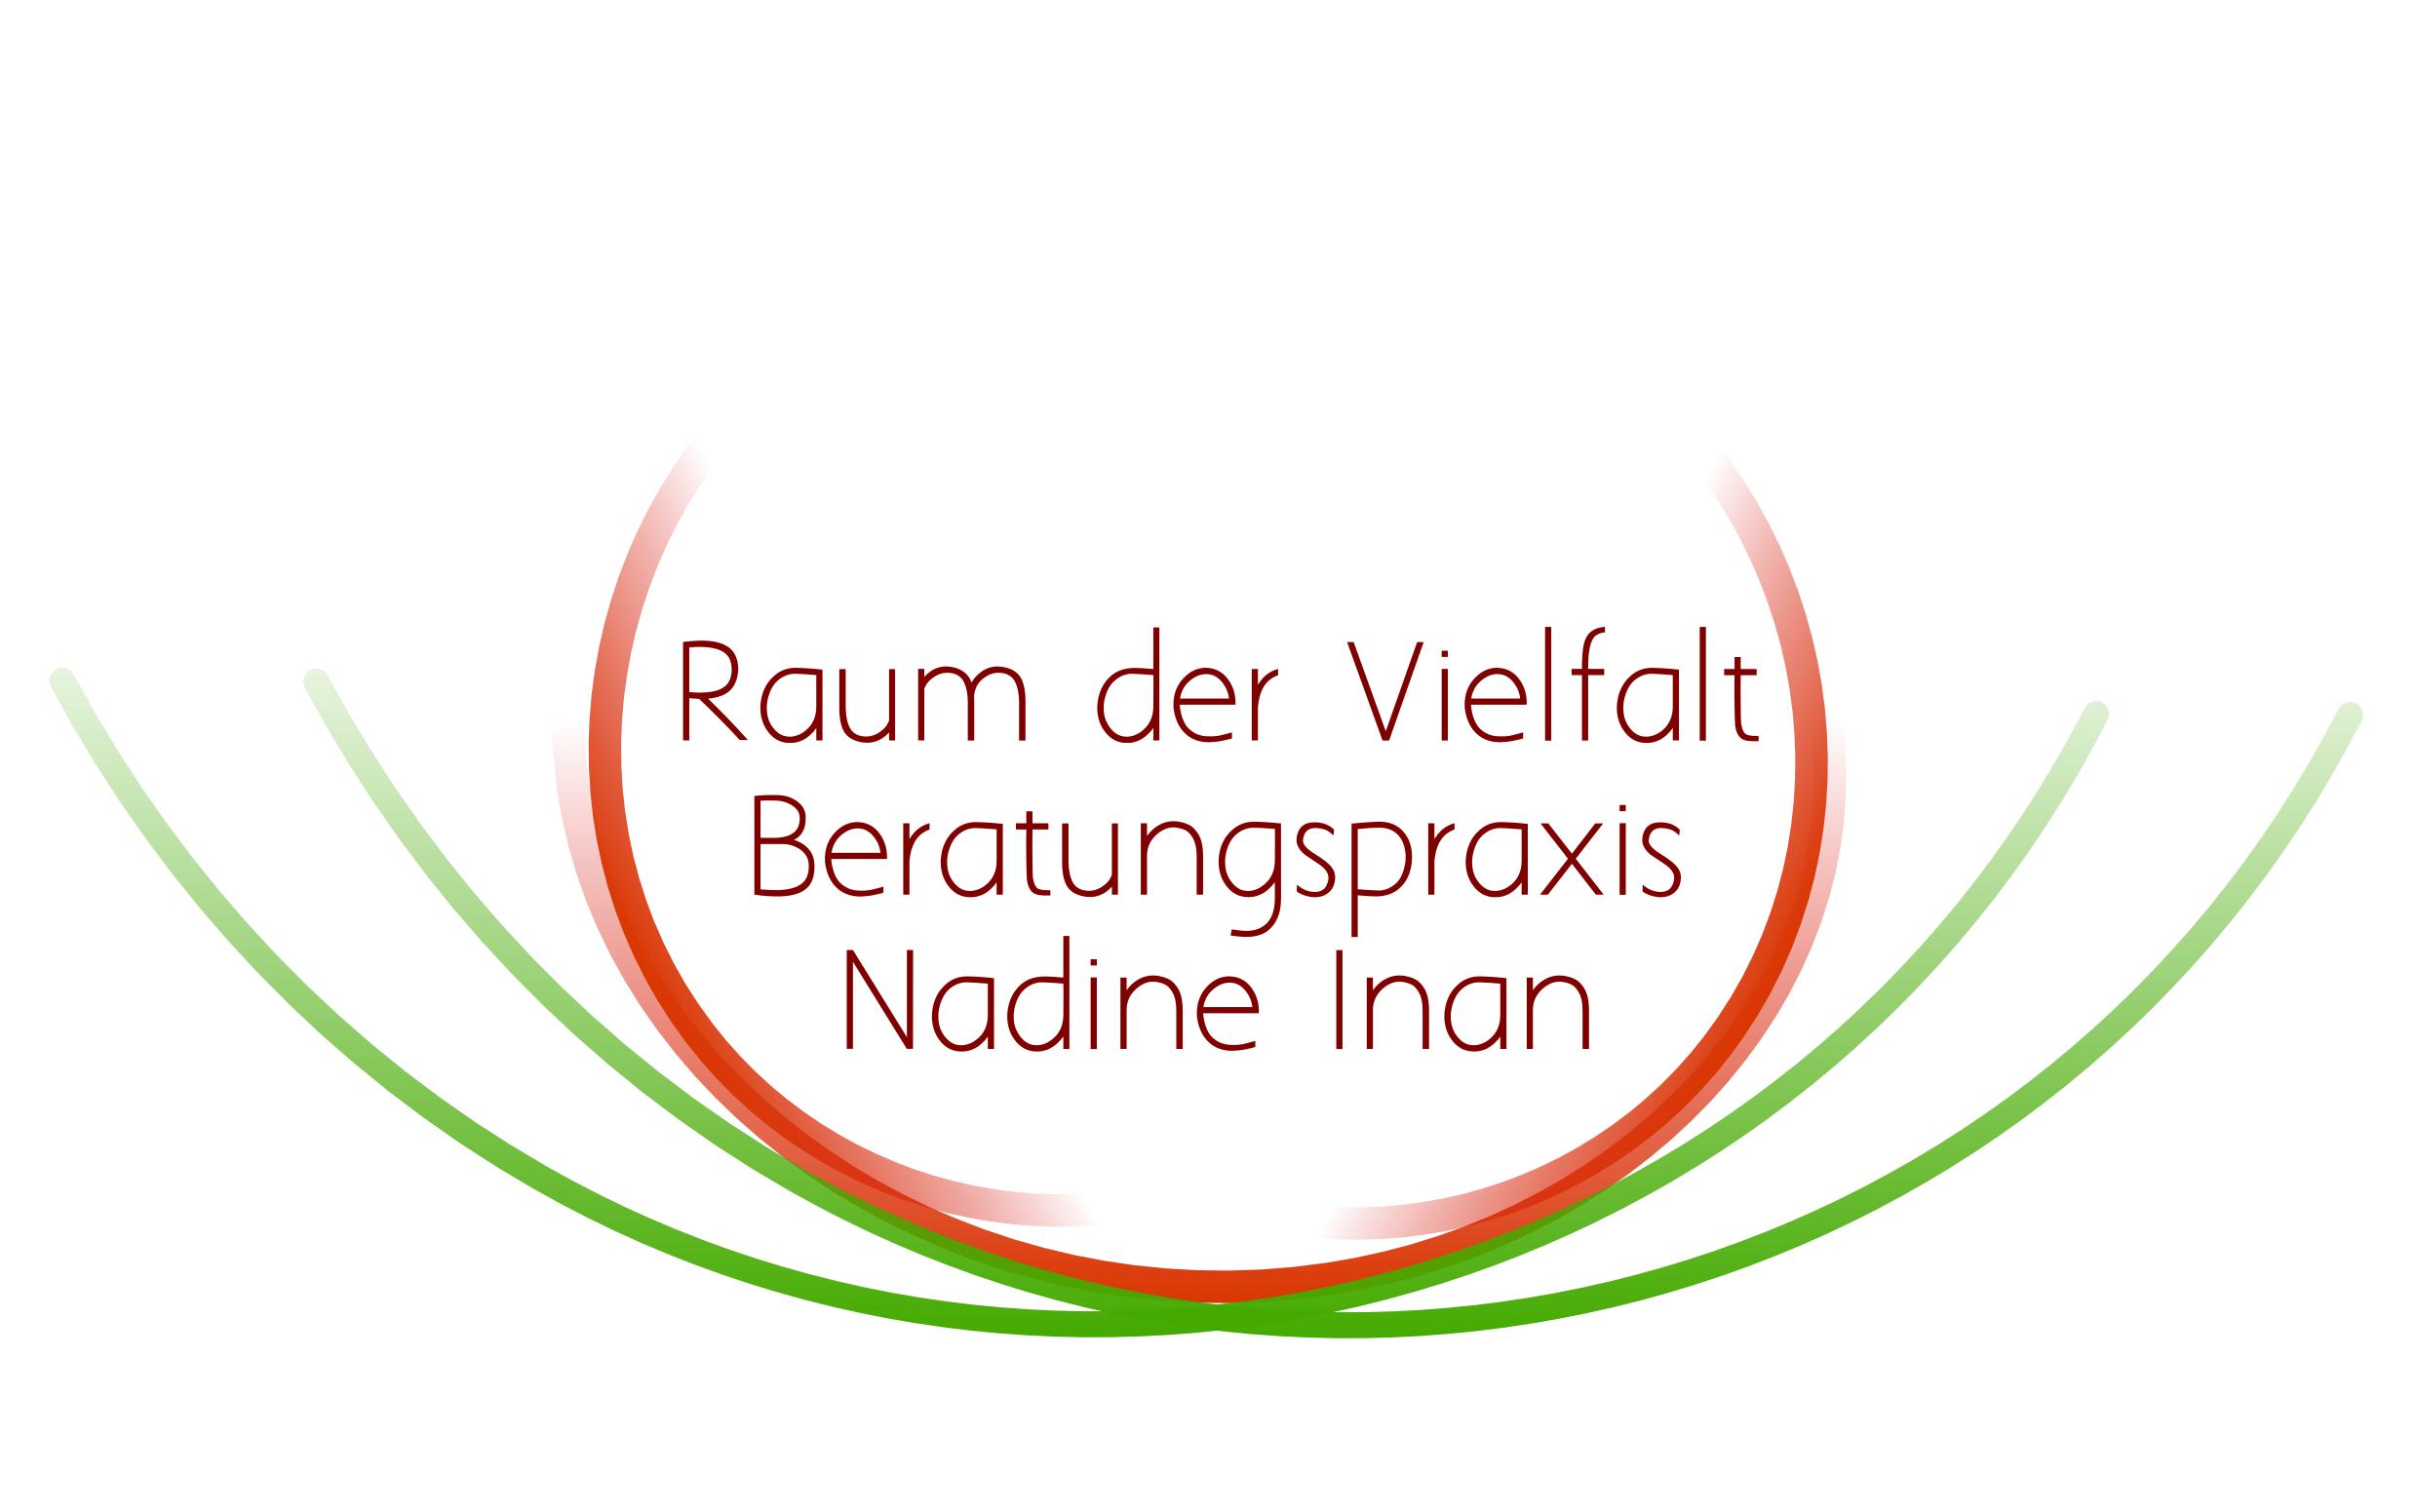 Beratungspraxis Nadine Inan